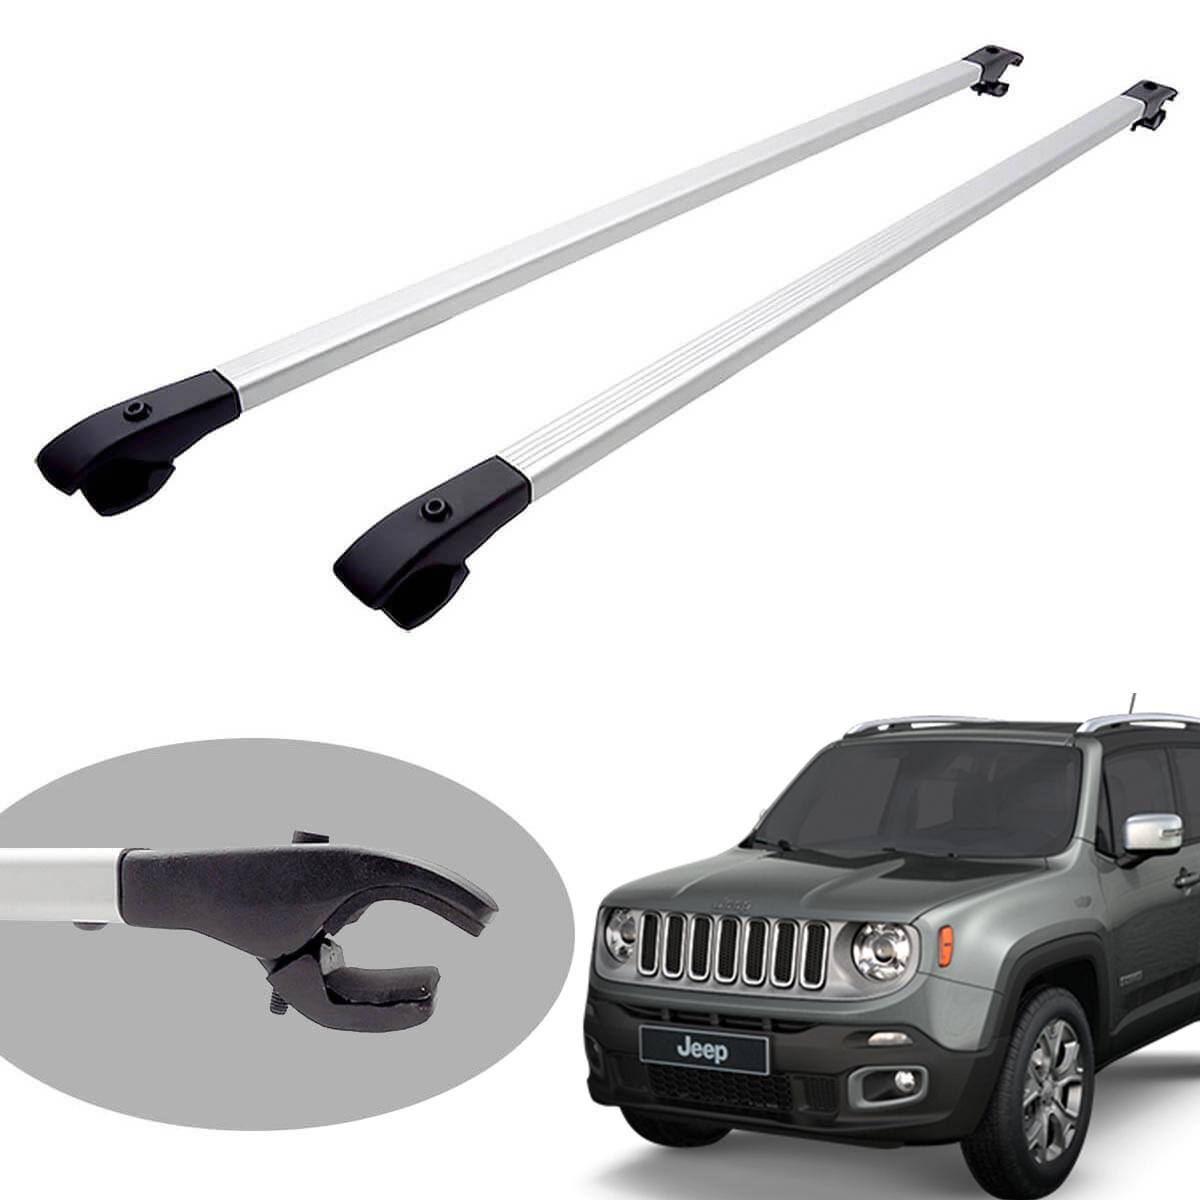 Travessa rack de teto alumínio Jeep Renegade 2016 2017 2018 2019